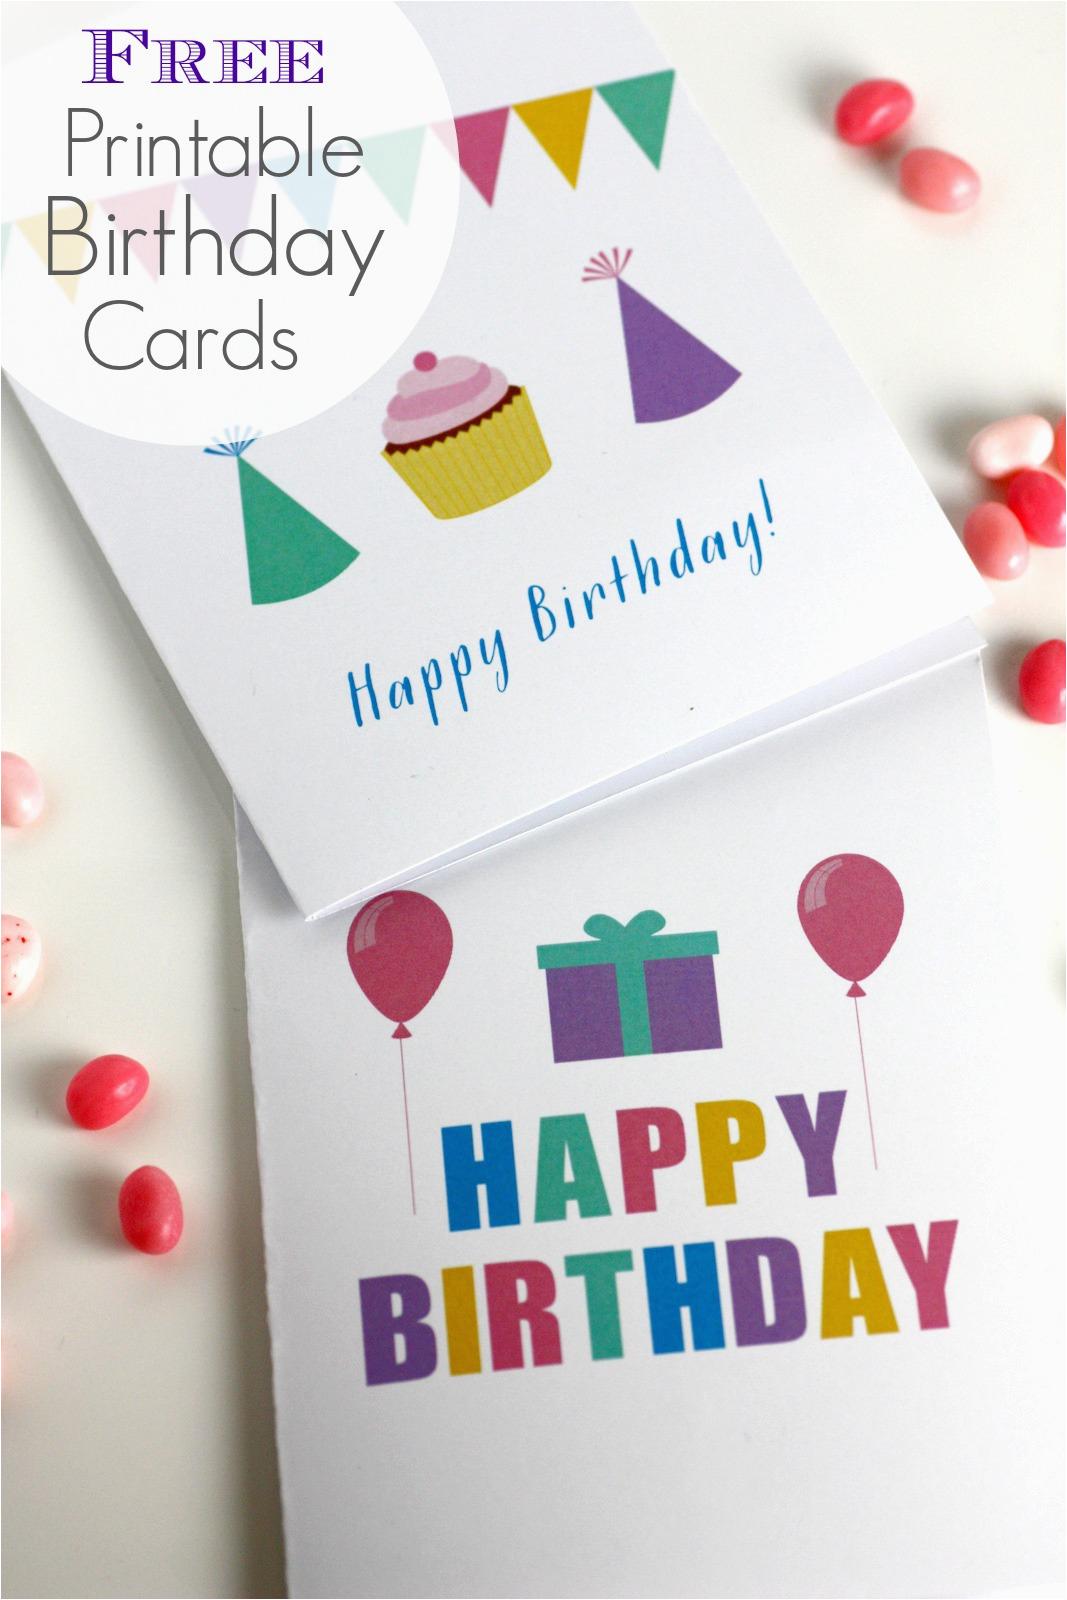 Free To Print Birthday Cards Birthdaybuzz